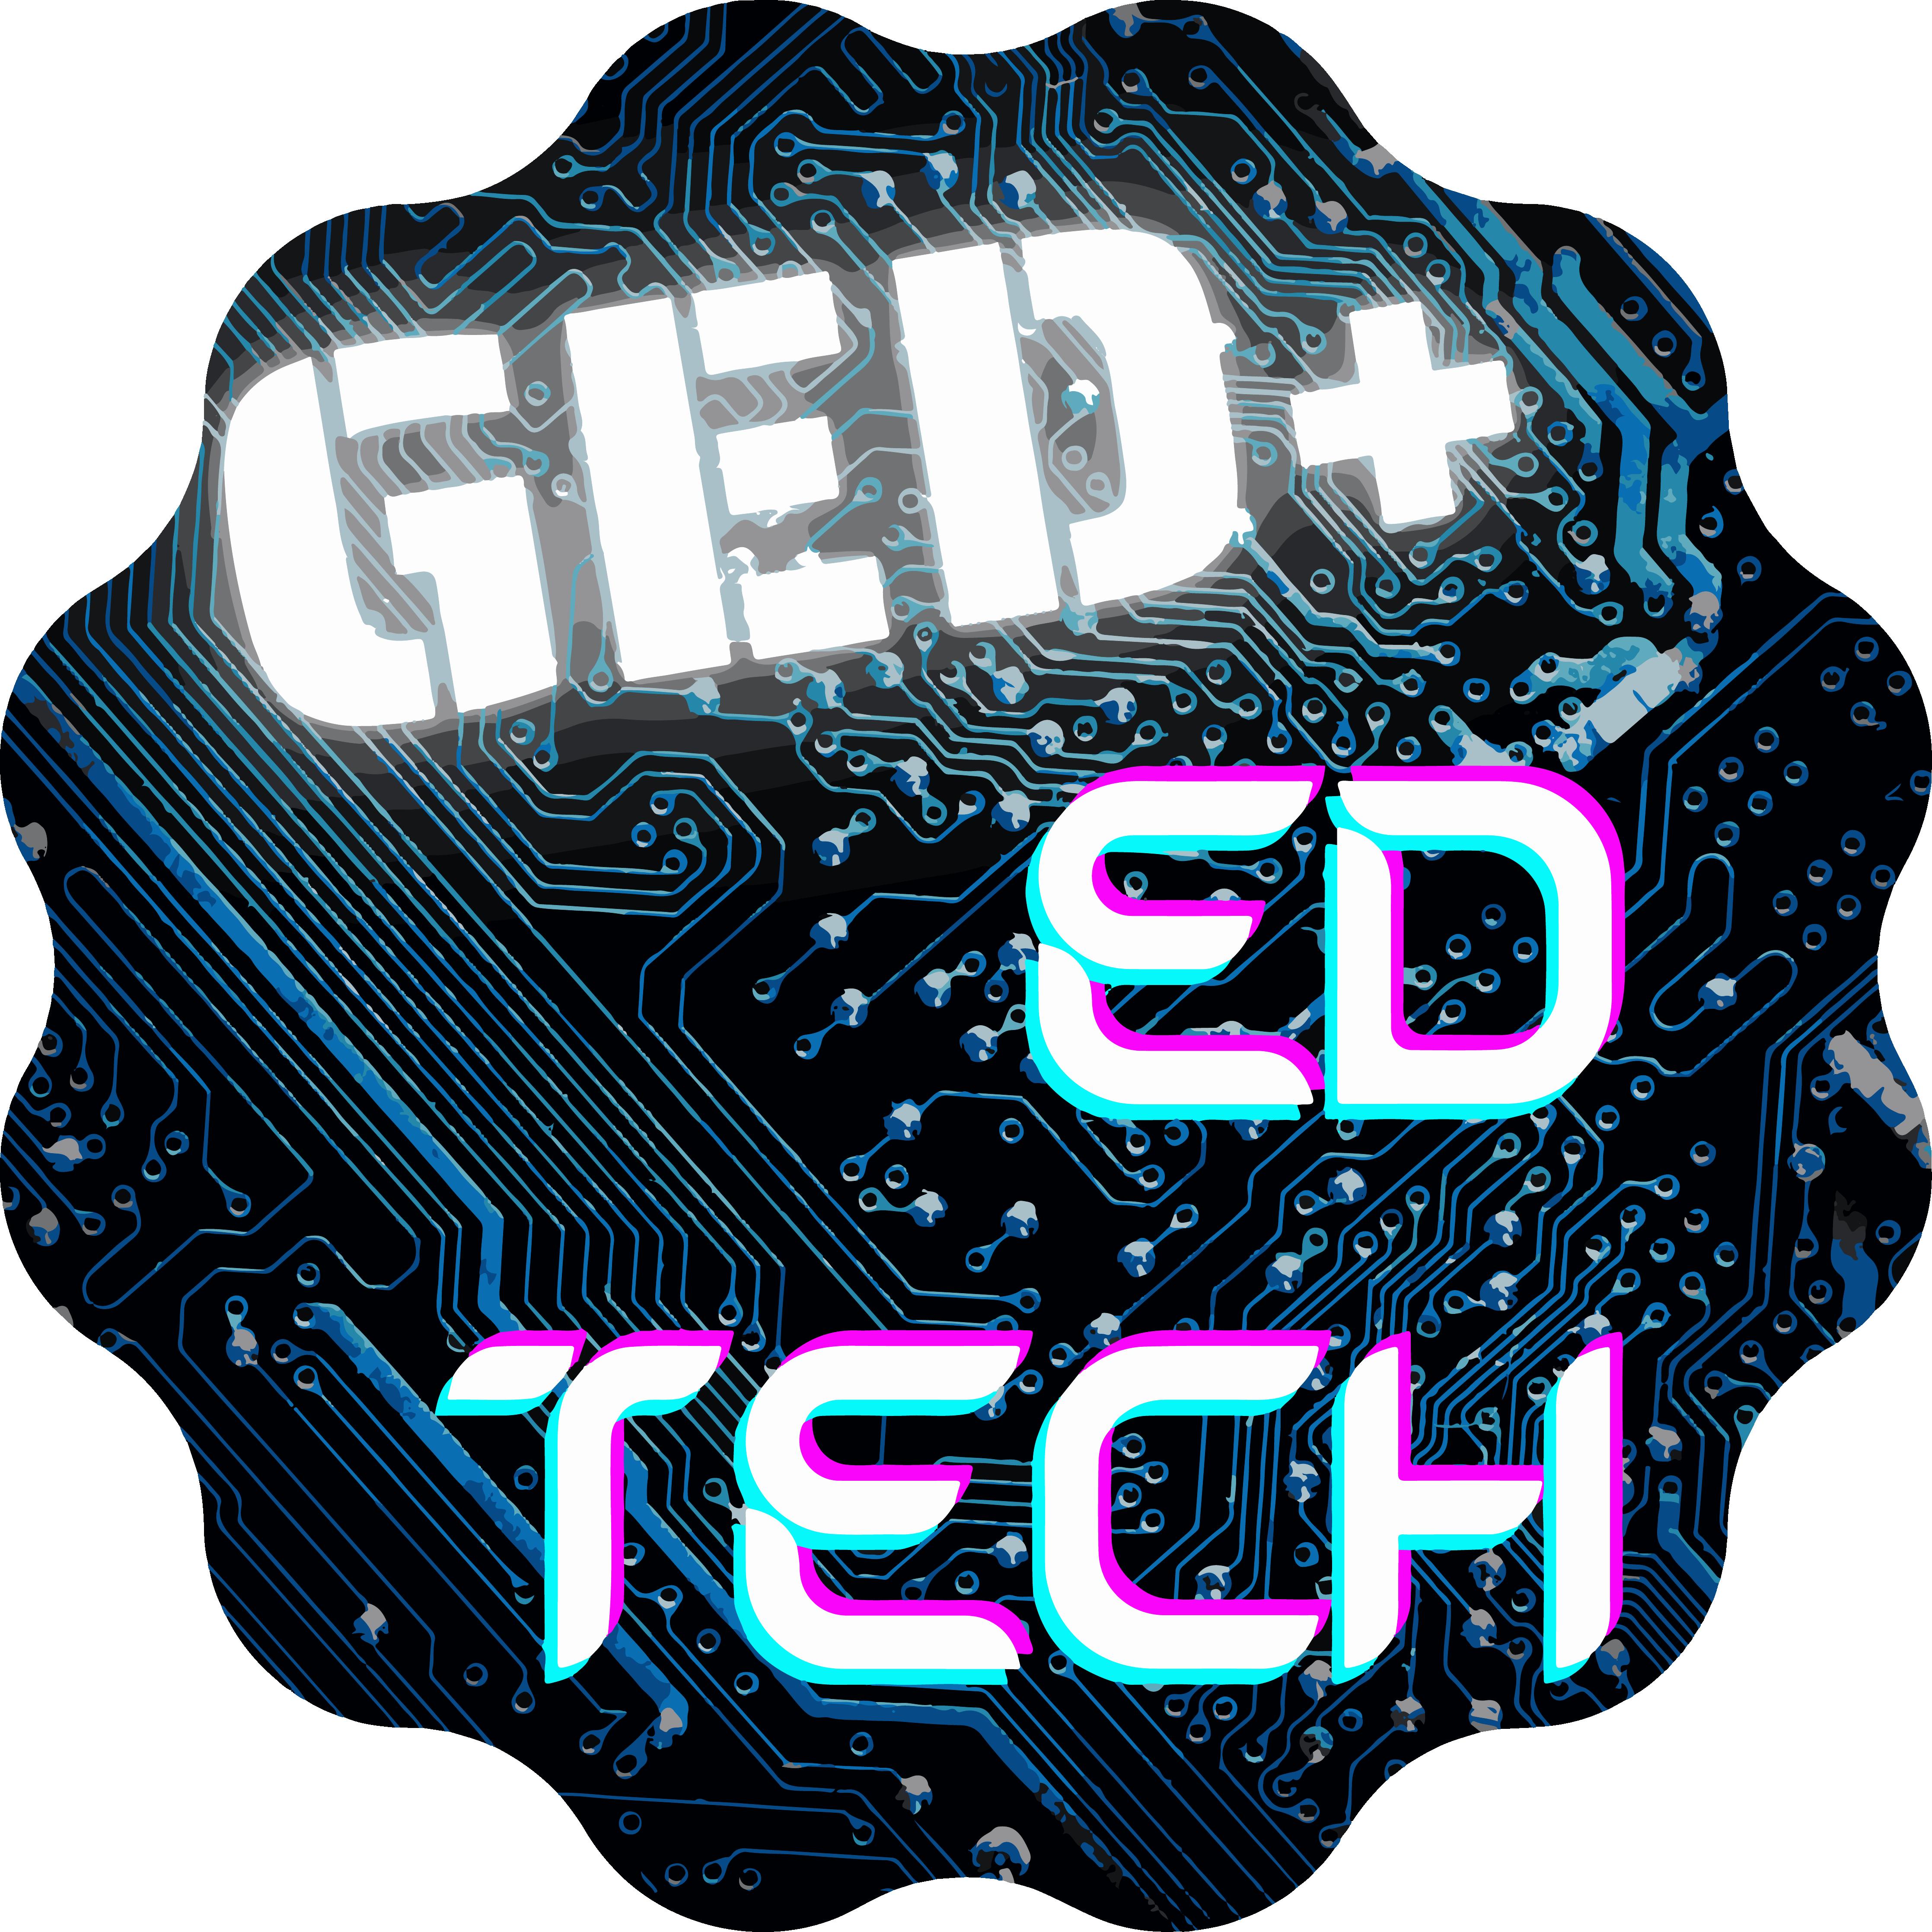 GED+ Ed Tech